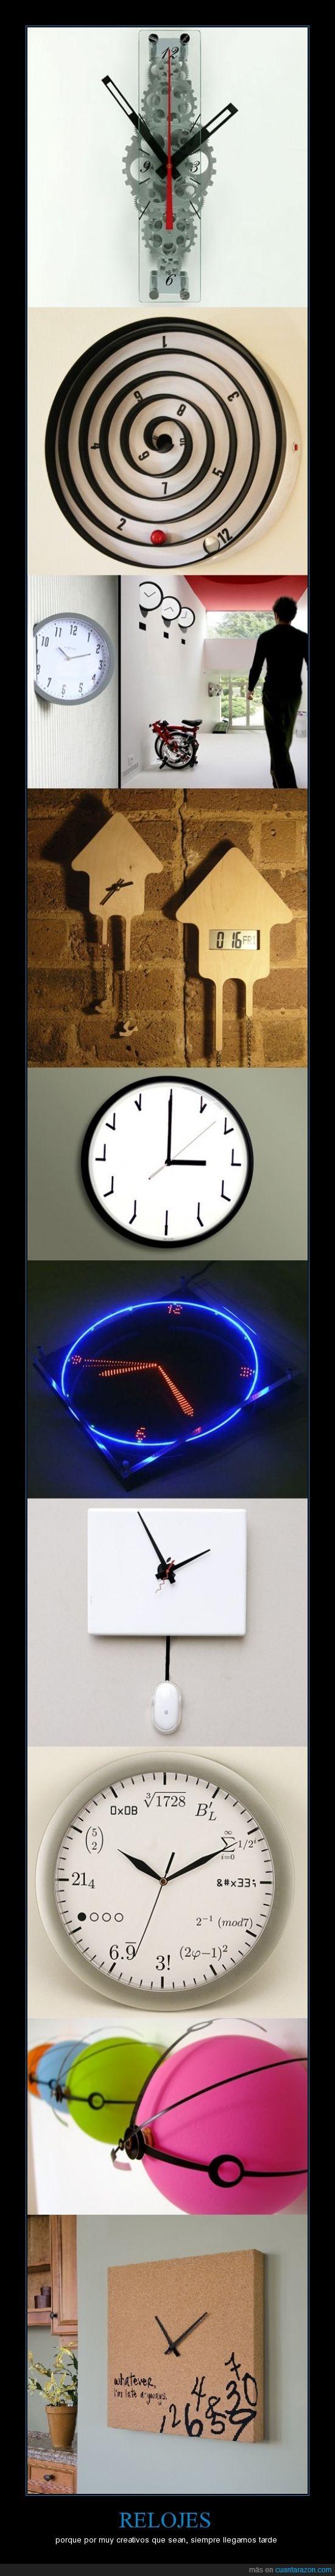 creativos,curiosos,llegar,relojes,tarde